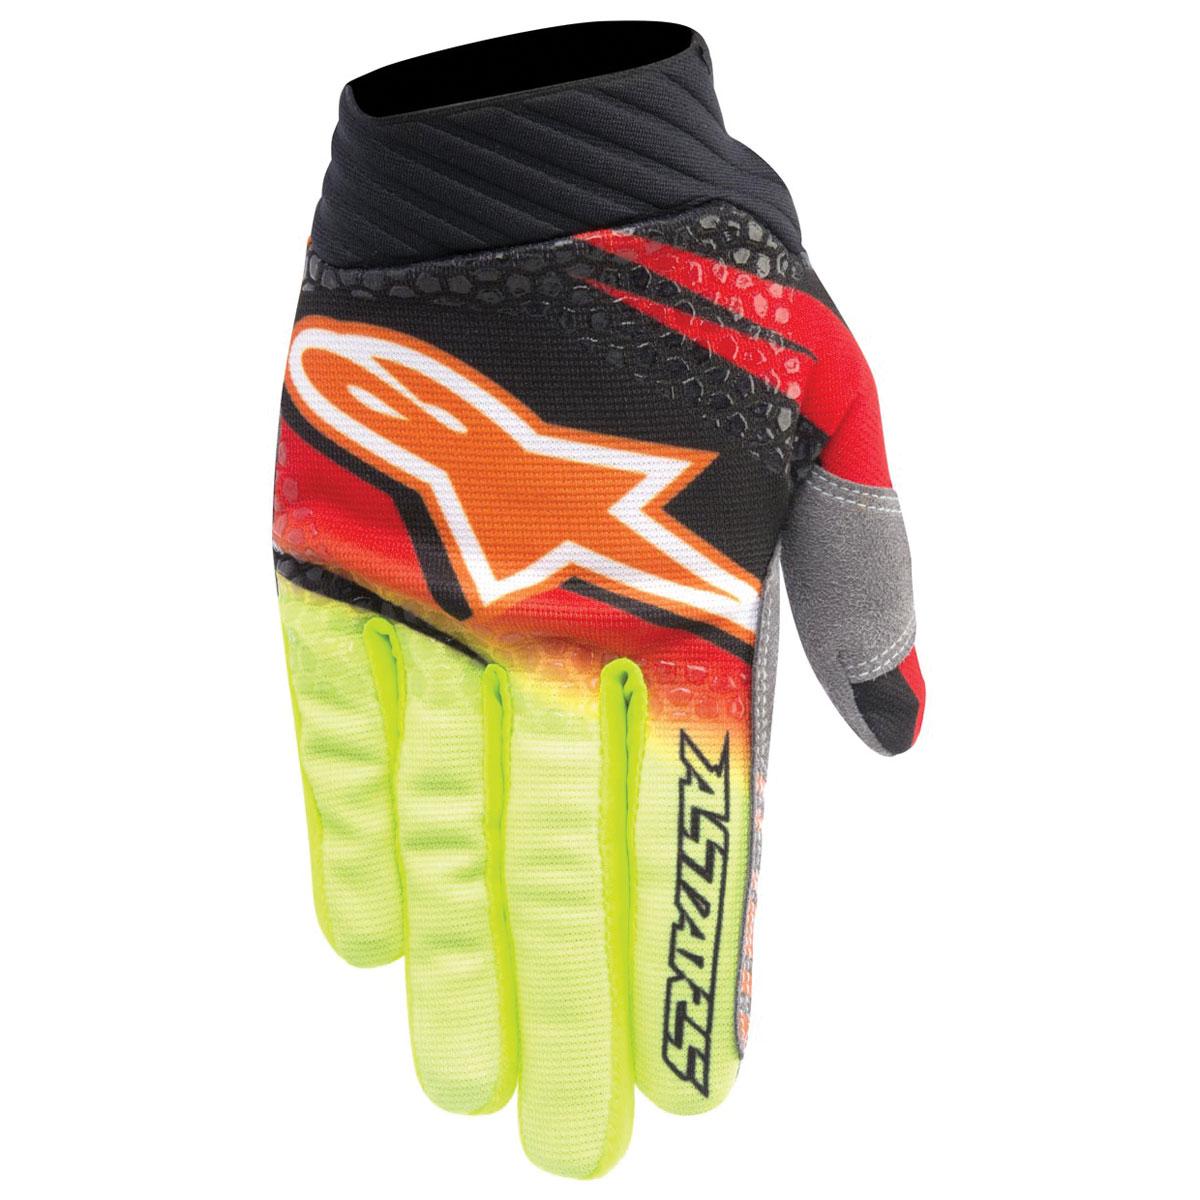 Alpinestars Men's Techstar Venom Red/Yellow Gloves